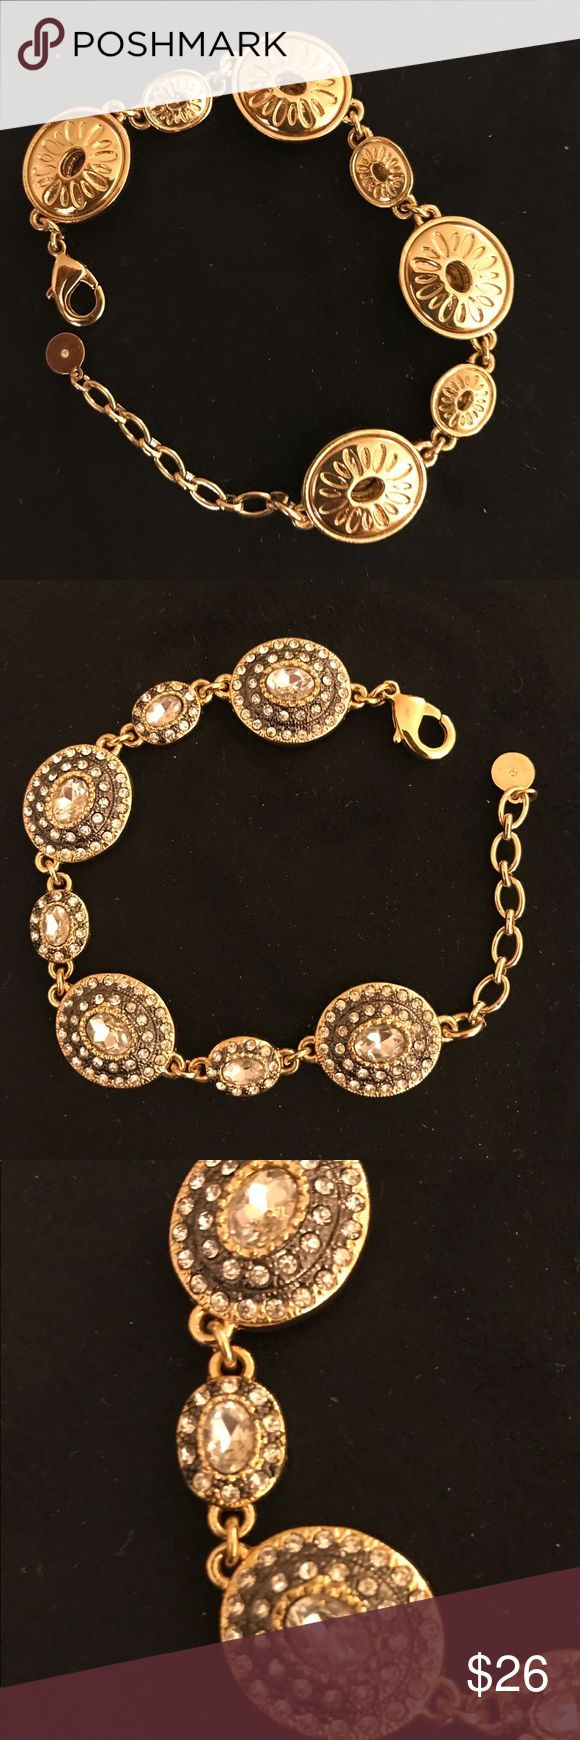 Stella and Dot Bracelet Beautiful Stella and Dot Bracelet! Gold, adjustable and blingy!!! Never worn. NWOB Stella & Dot Jewelry Bracelets